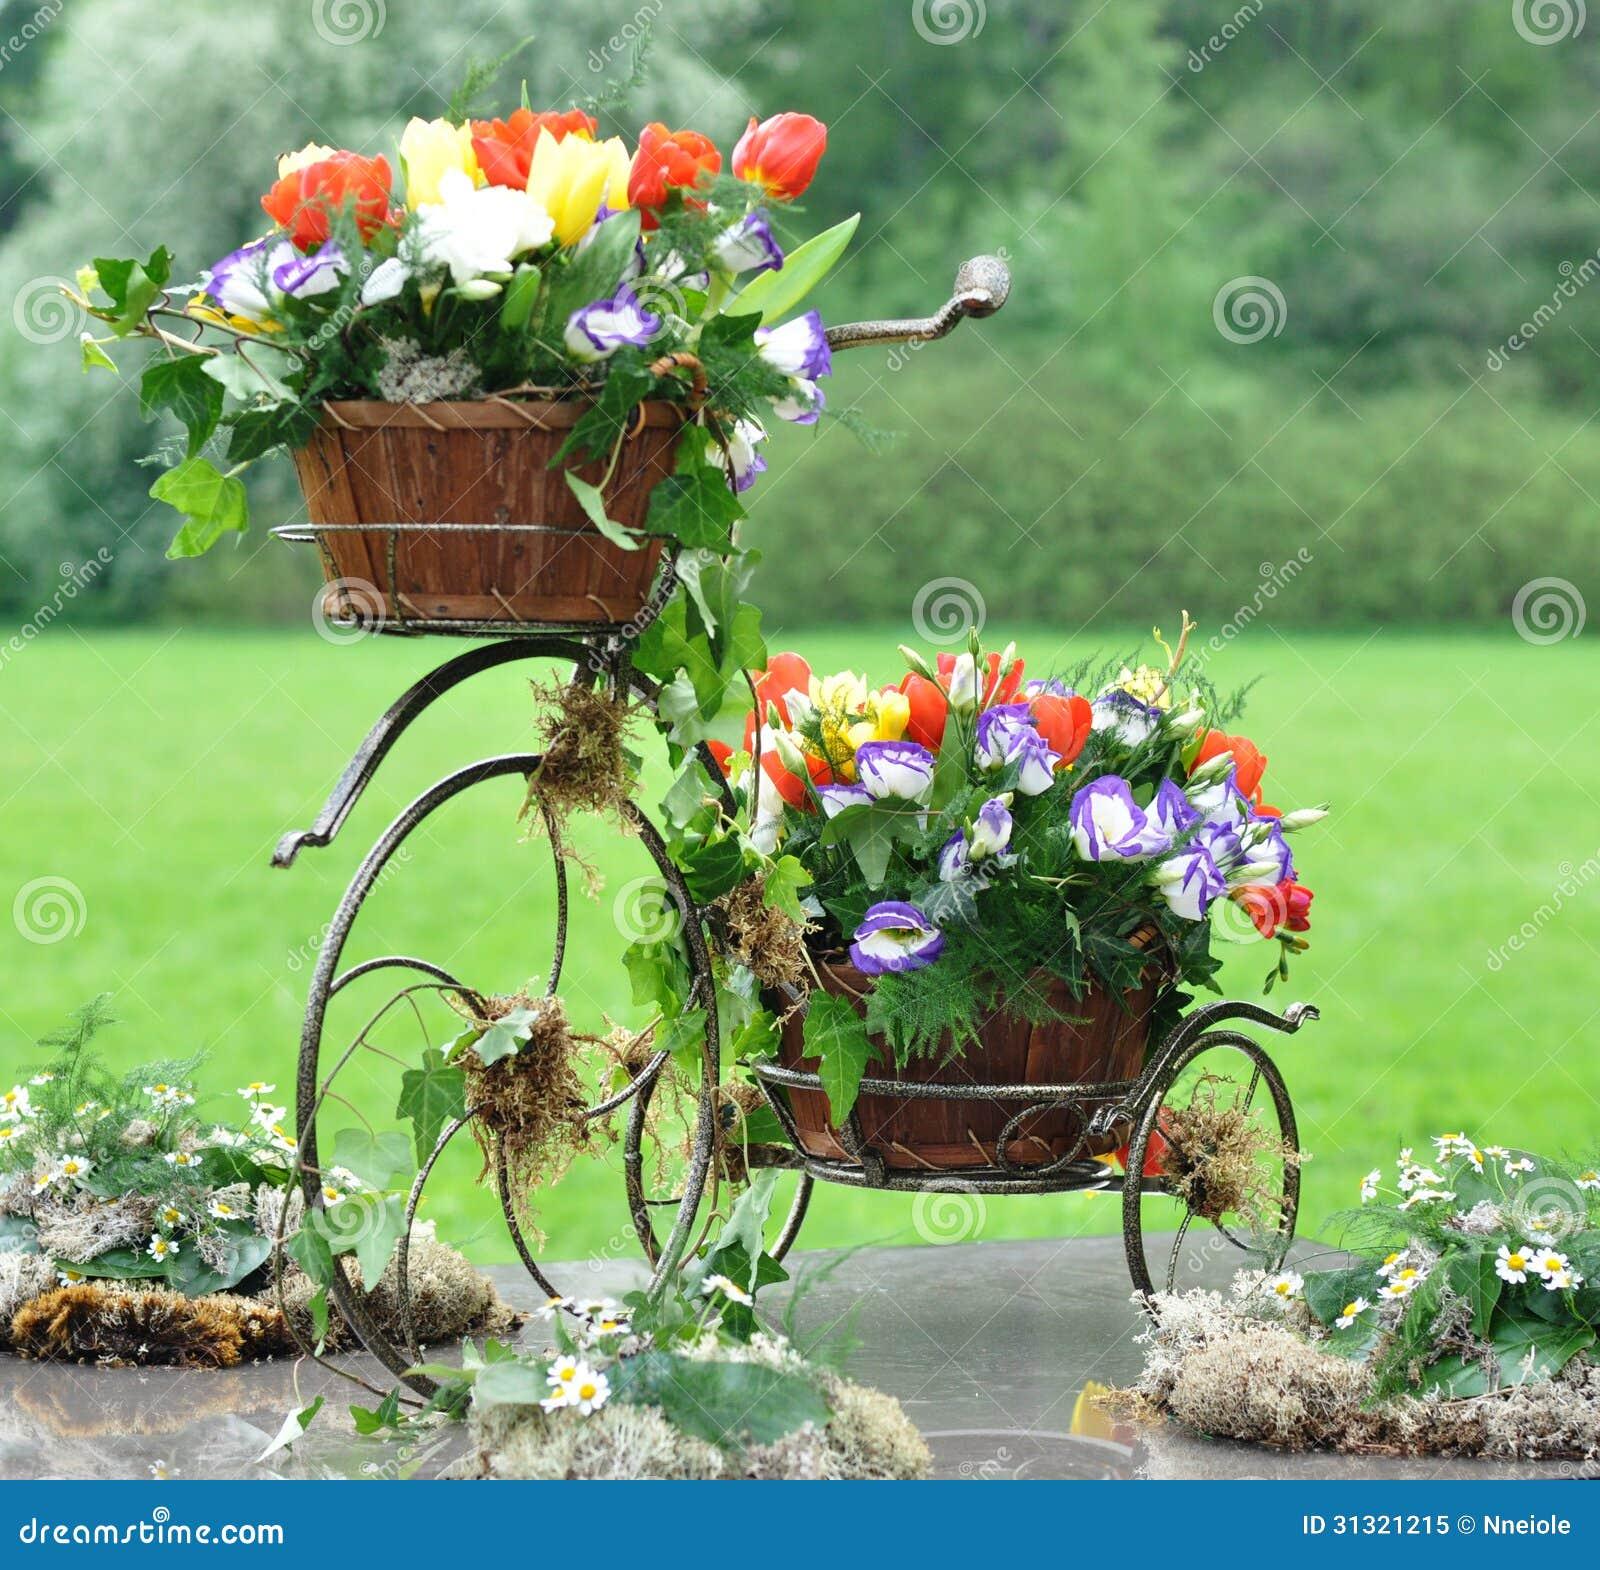 Vintage Garden Bicycle Royalty Free Stock Photo - Image: 31321215